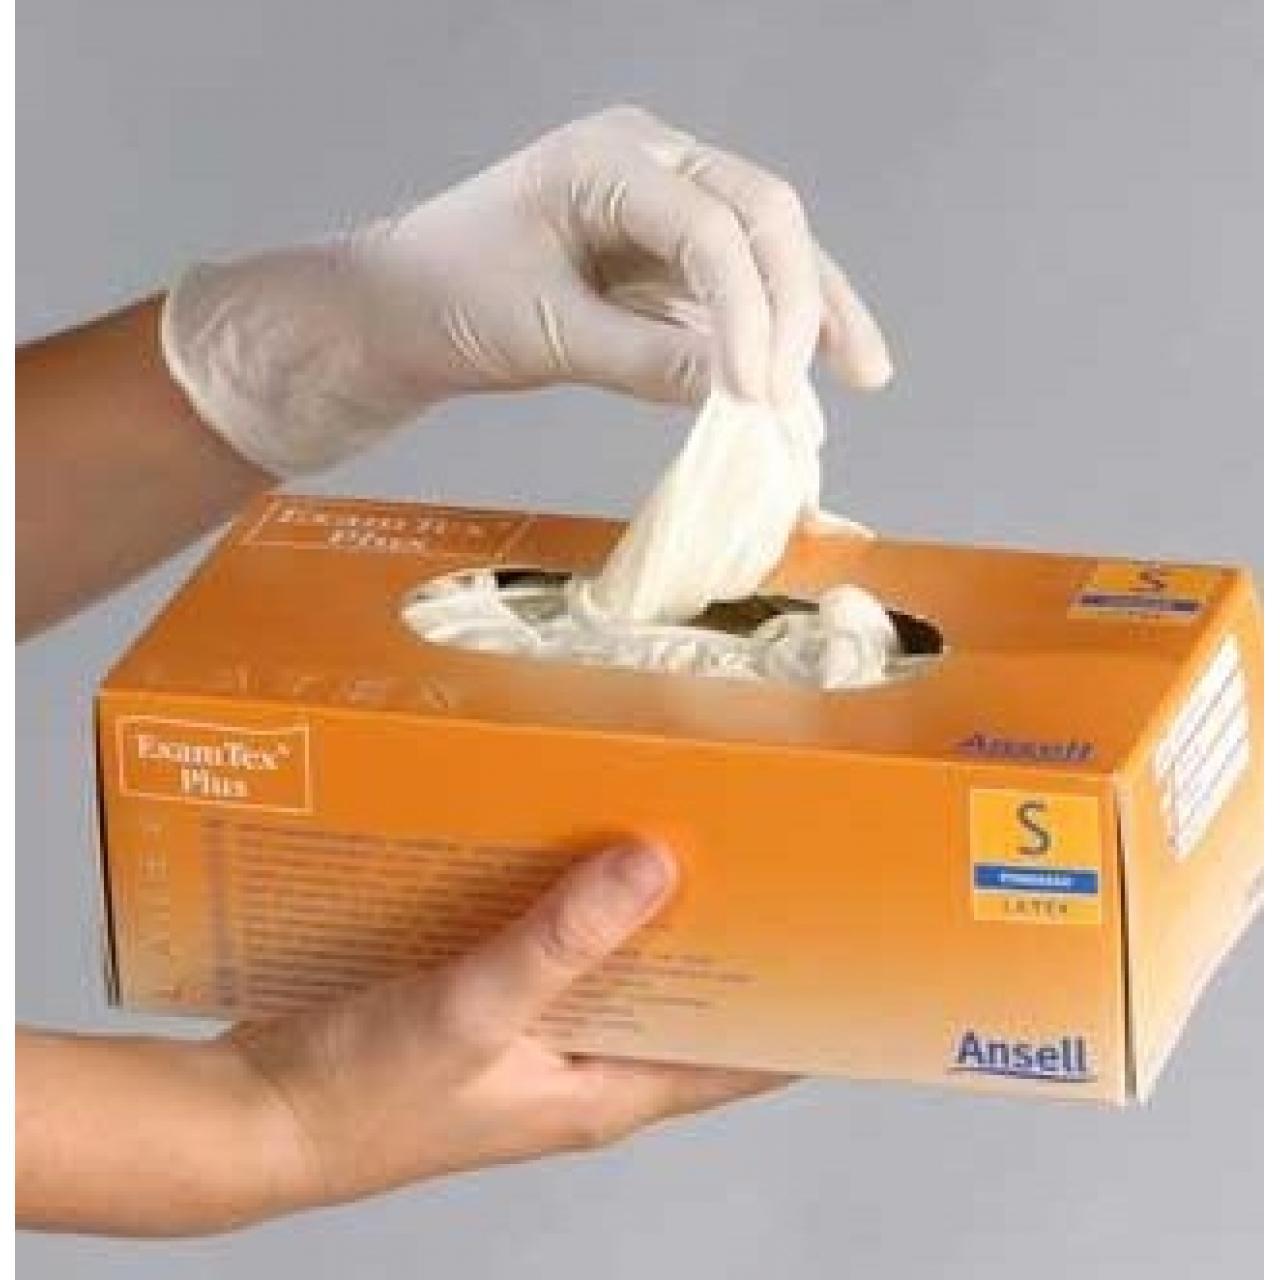 hygiene emballages sens votre sp cialiste de l 39 emballage. Black Bedroom Furniture Sets. Home Design Ideas